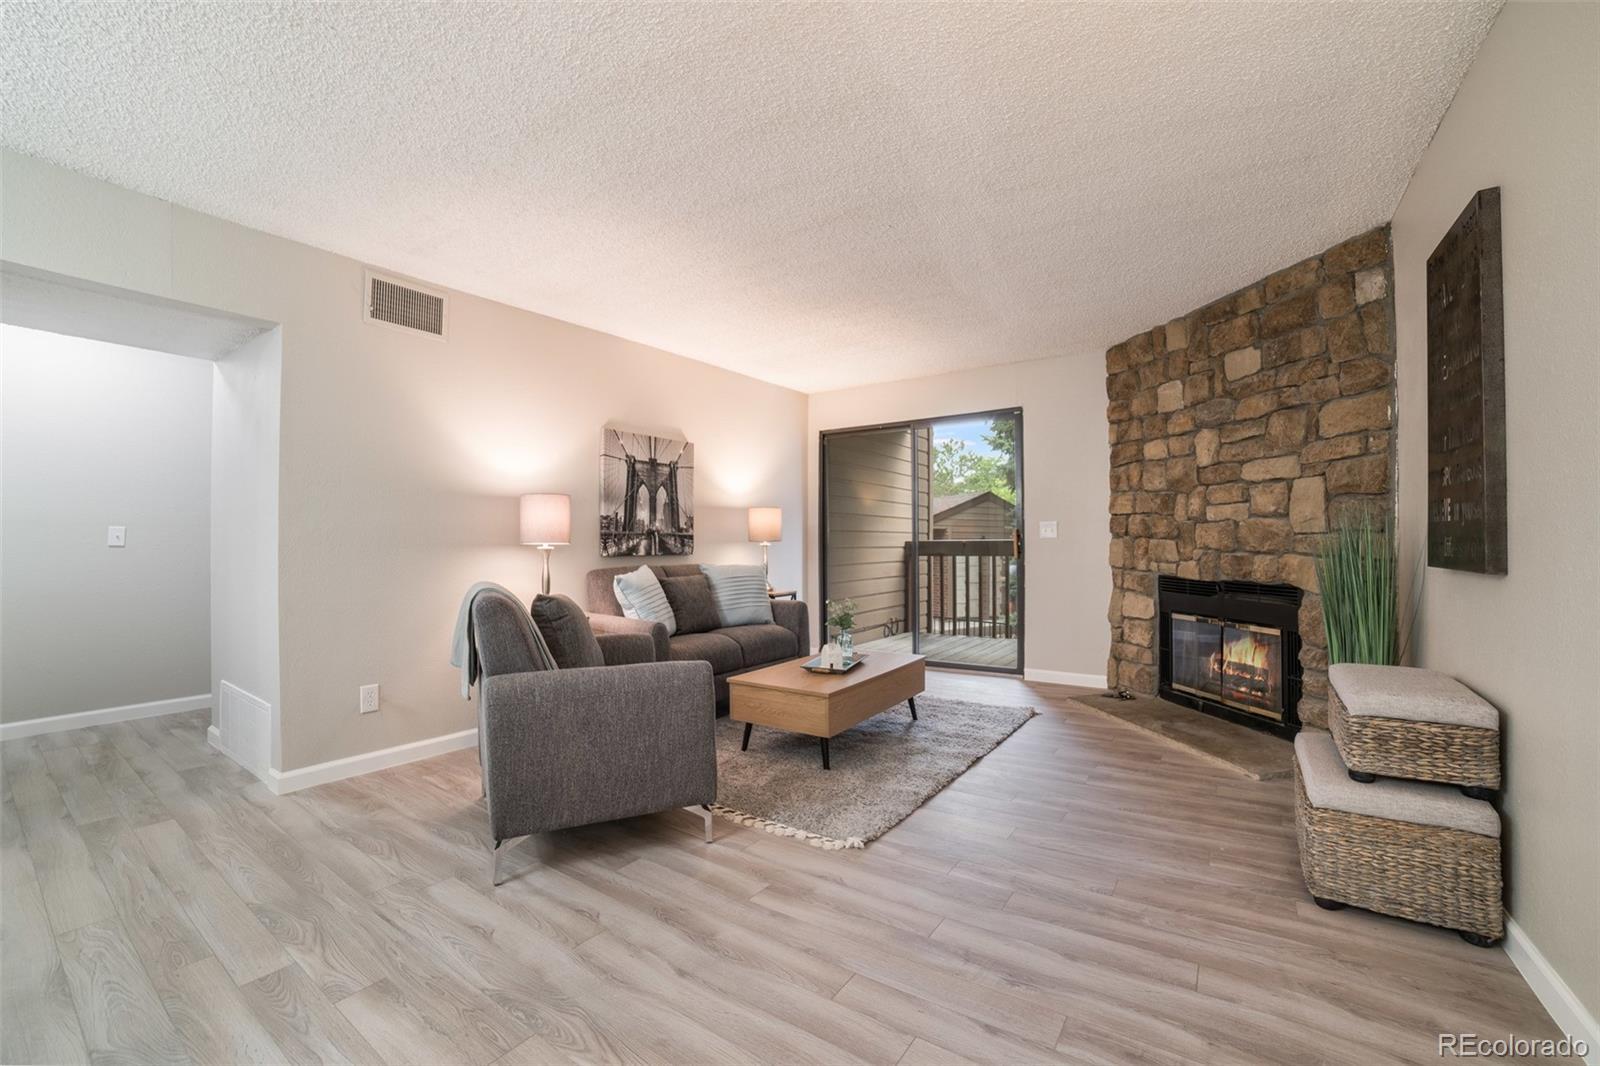 MLS# 8386467 - 2 - 220 Wright Street #203, Lakewood, CO 80228